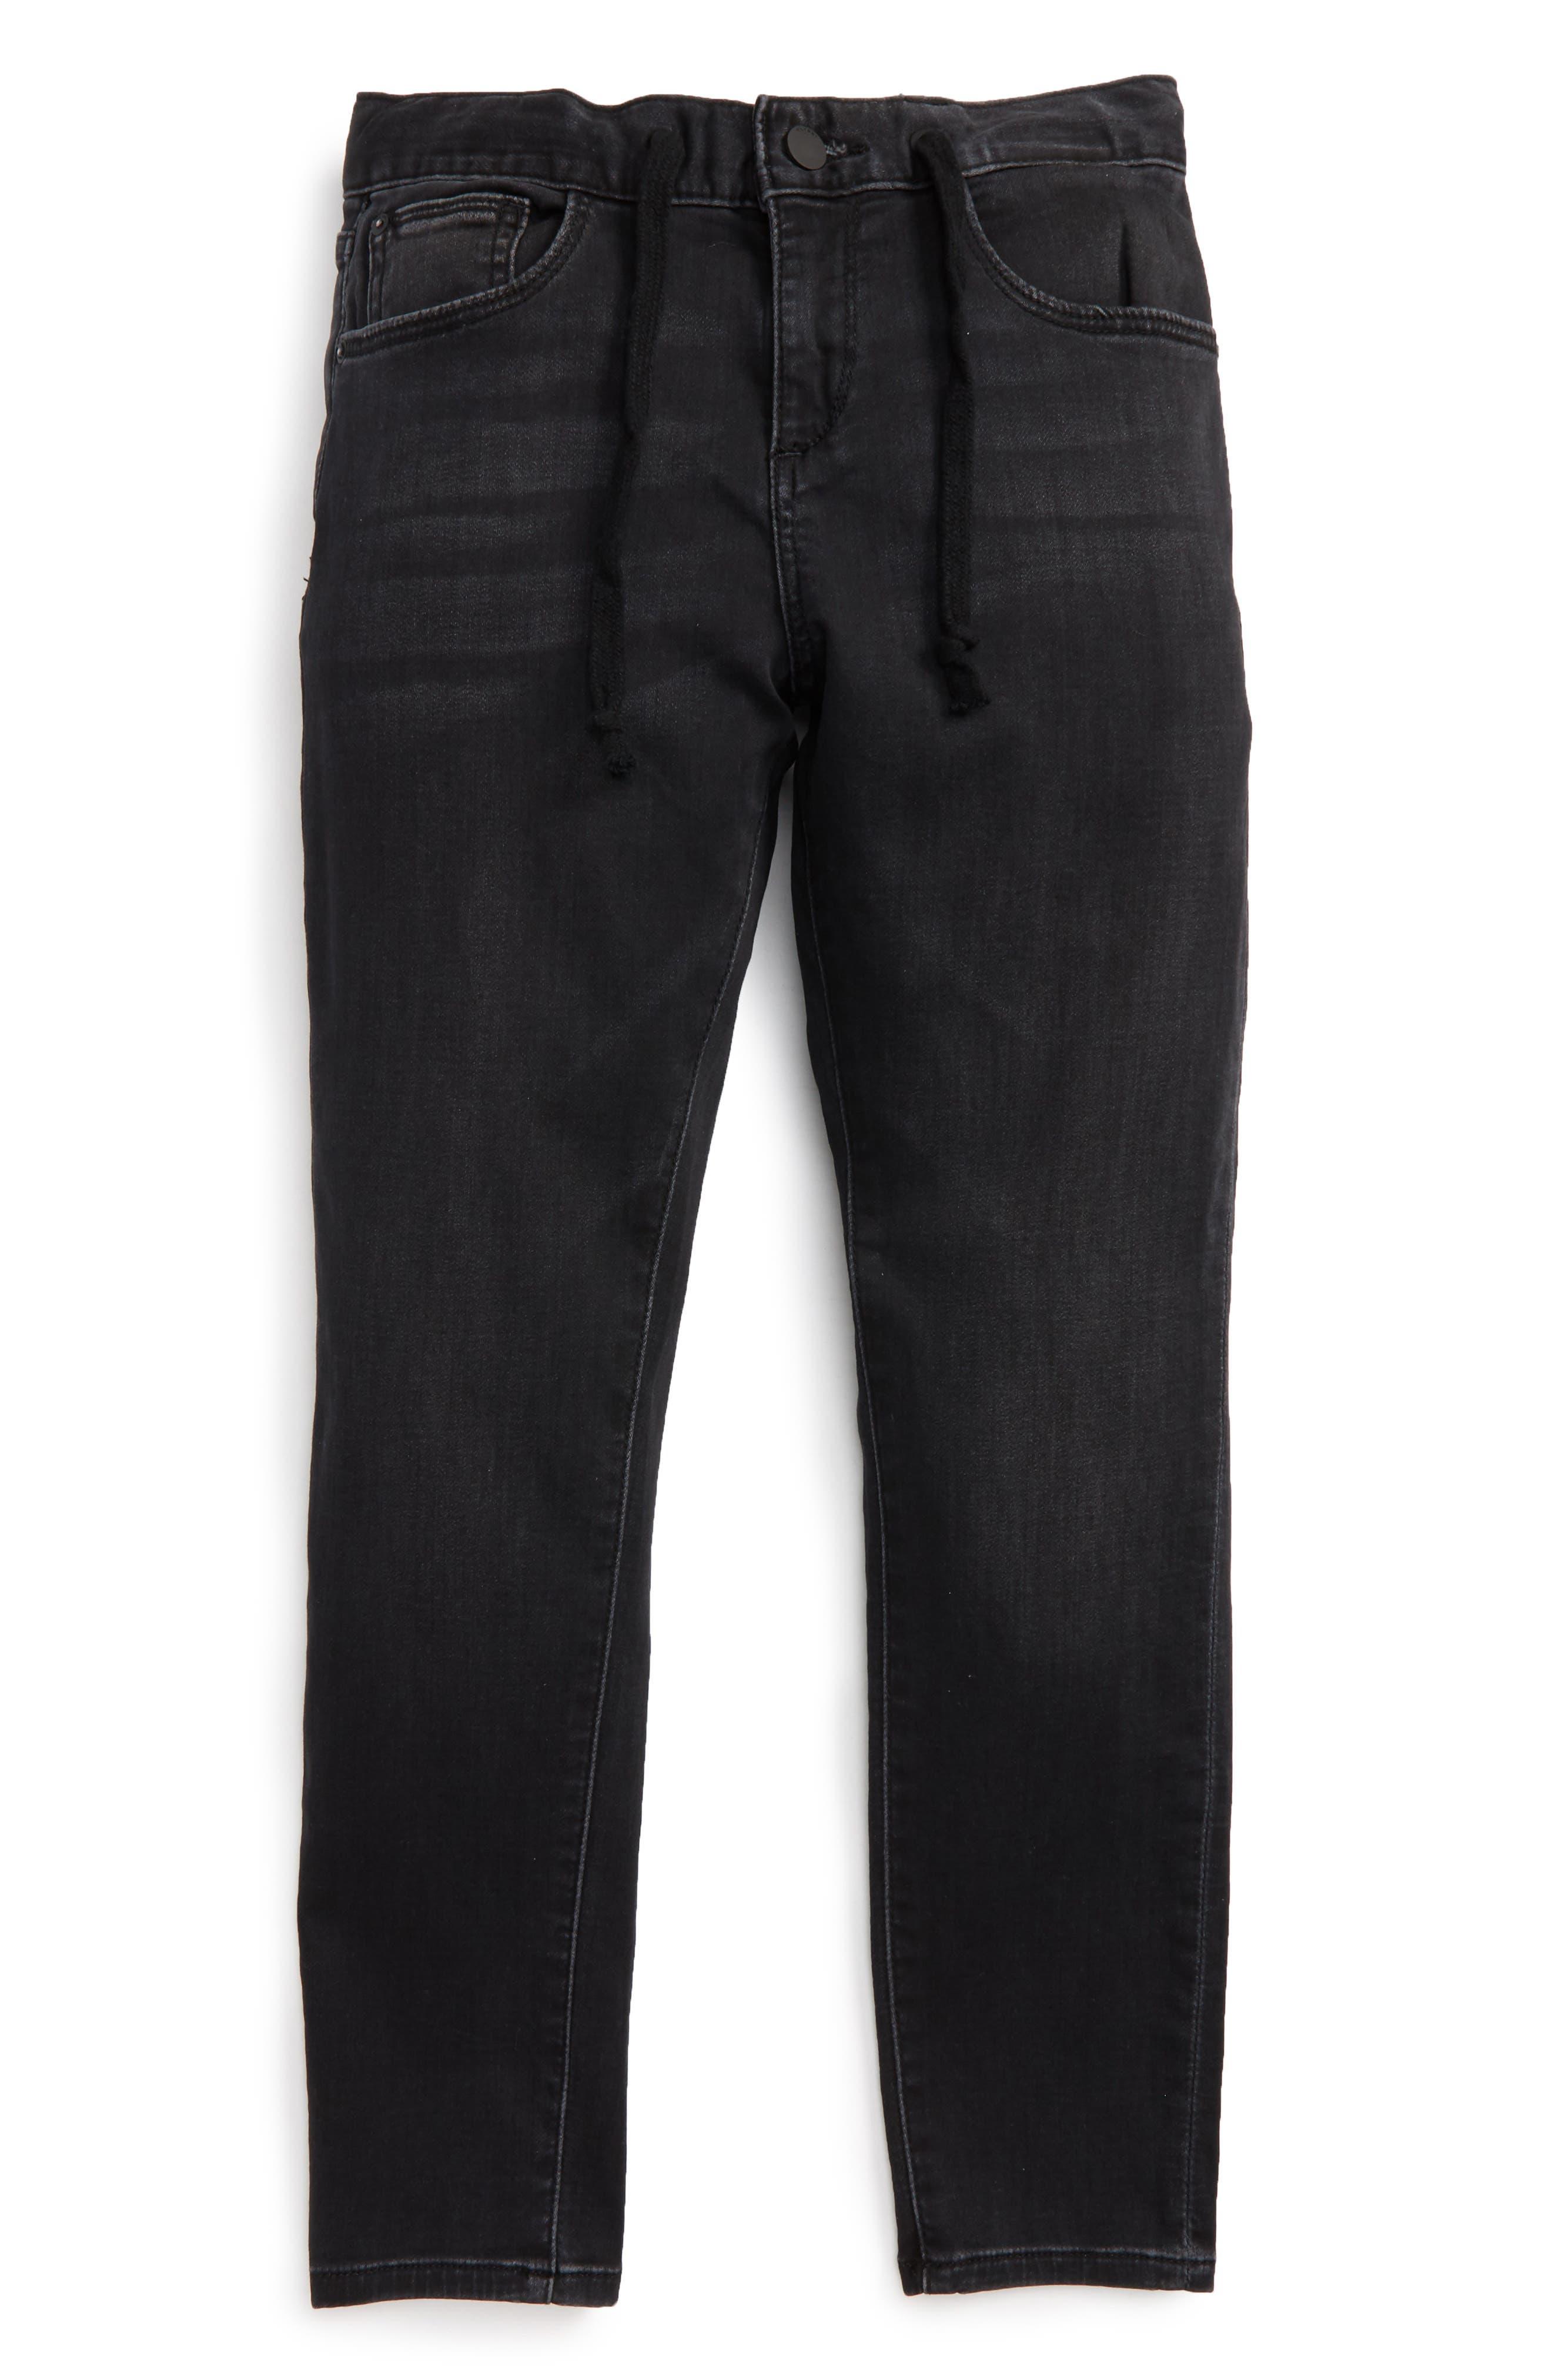 William Straight Leg Jeans,                             Main thumbnail 1, color,                             020